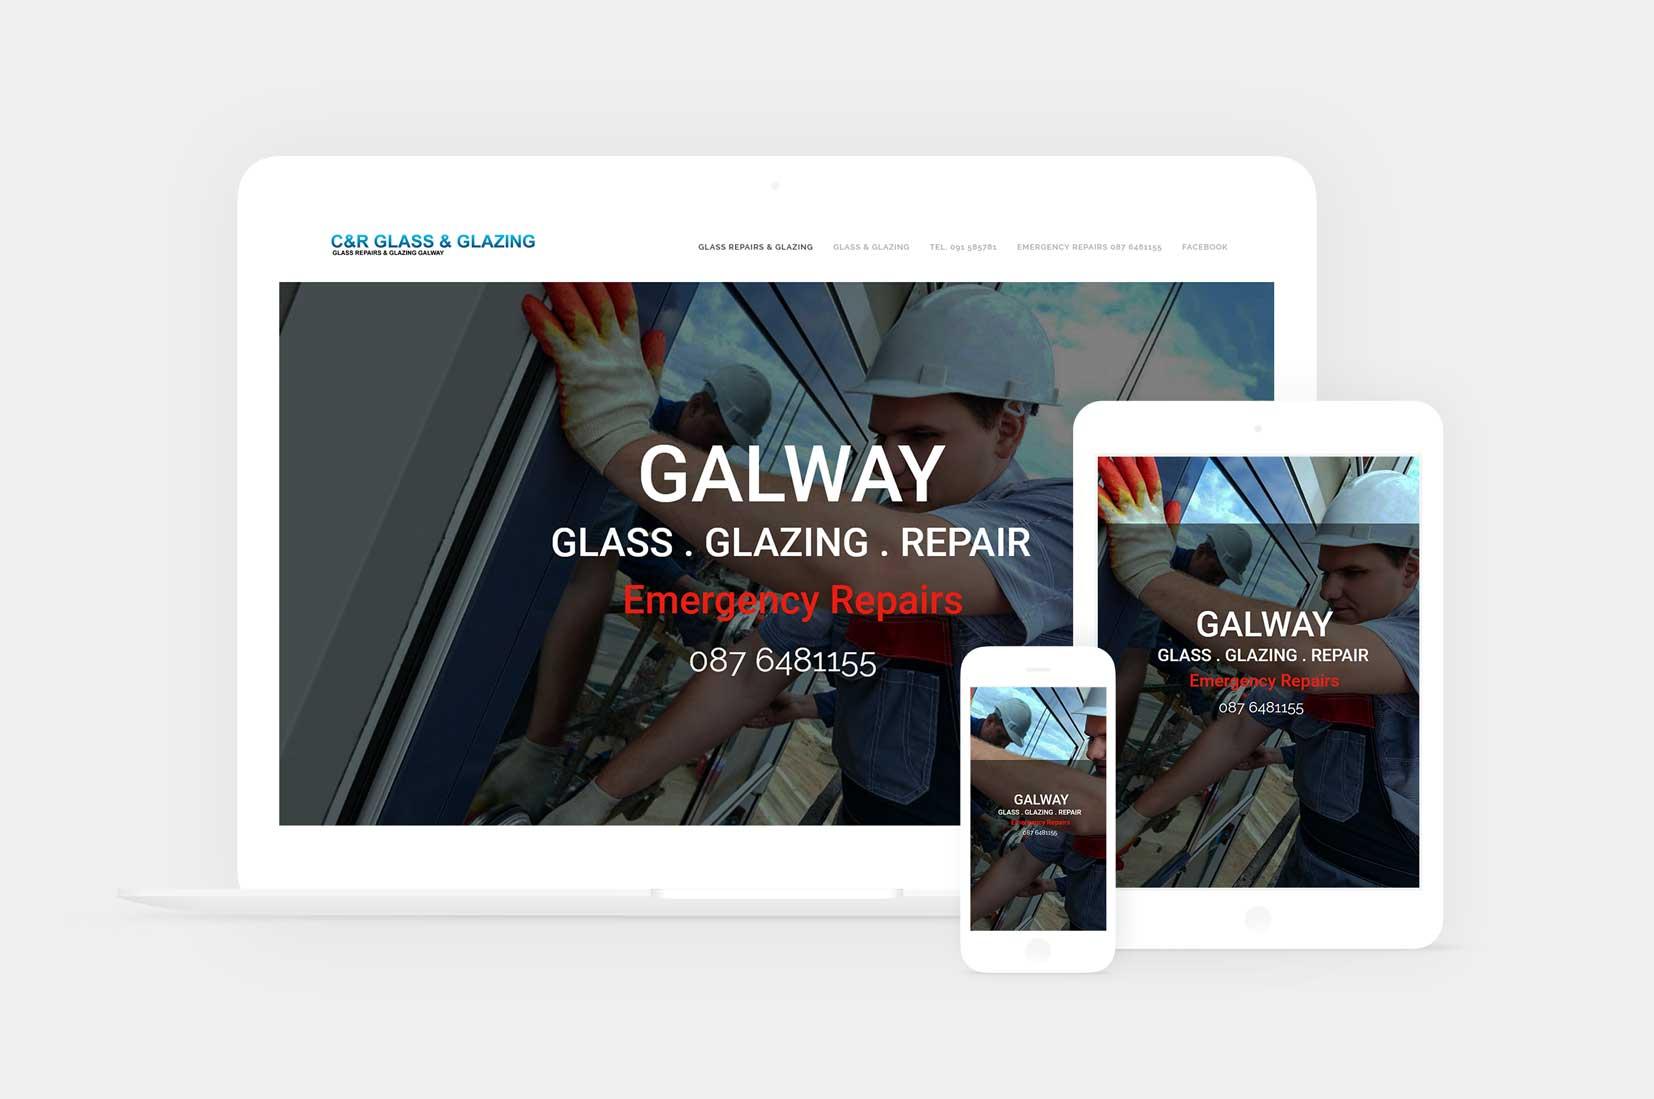 Website design for glass galway